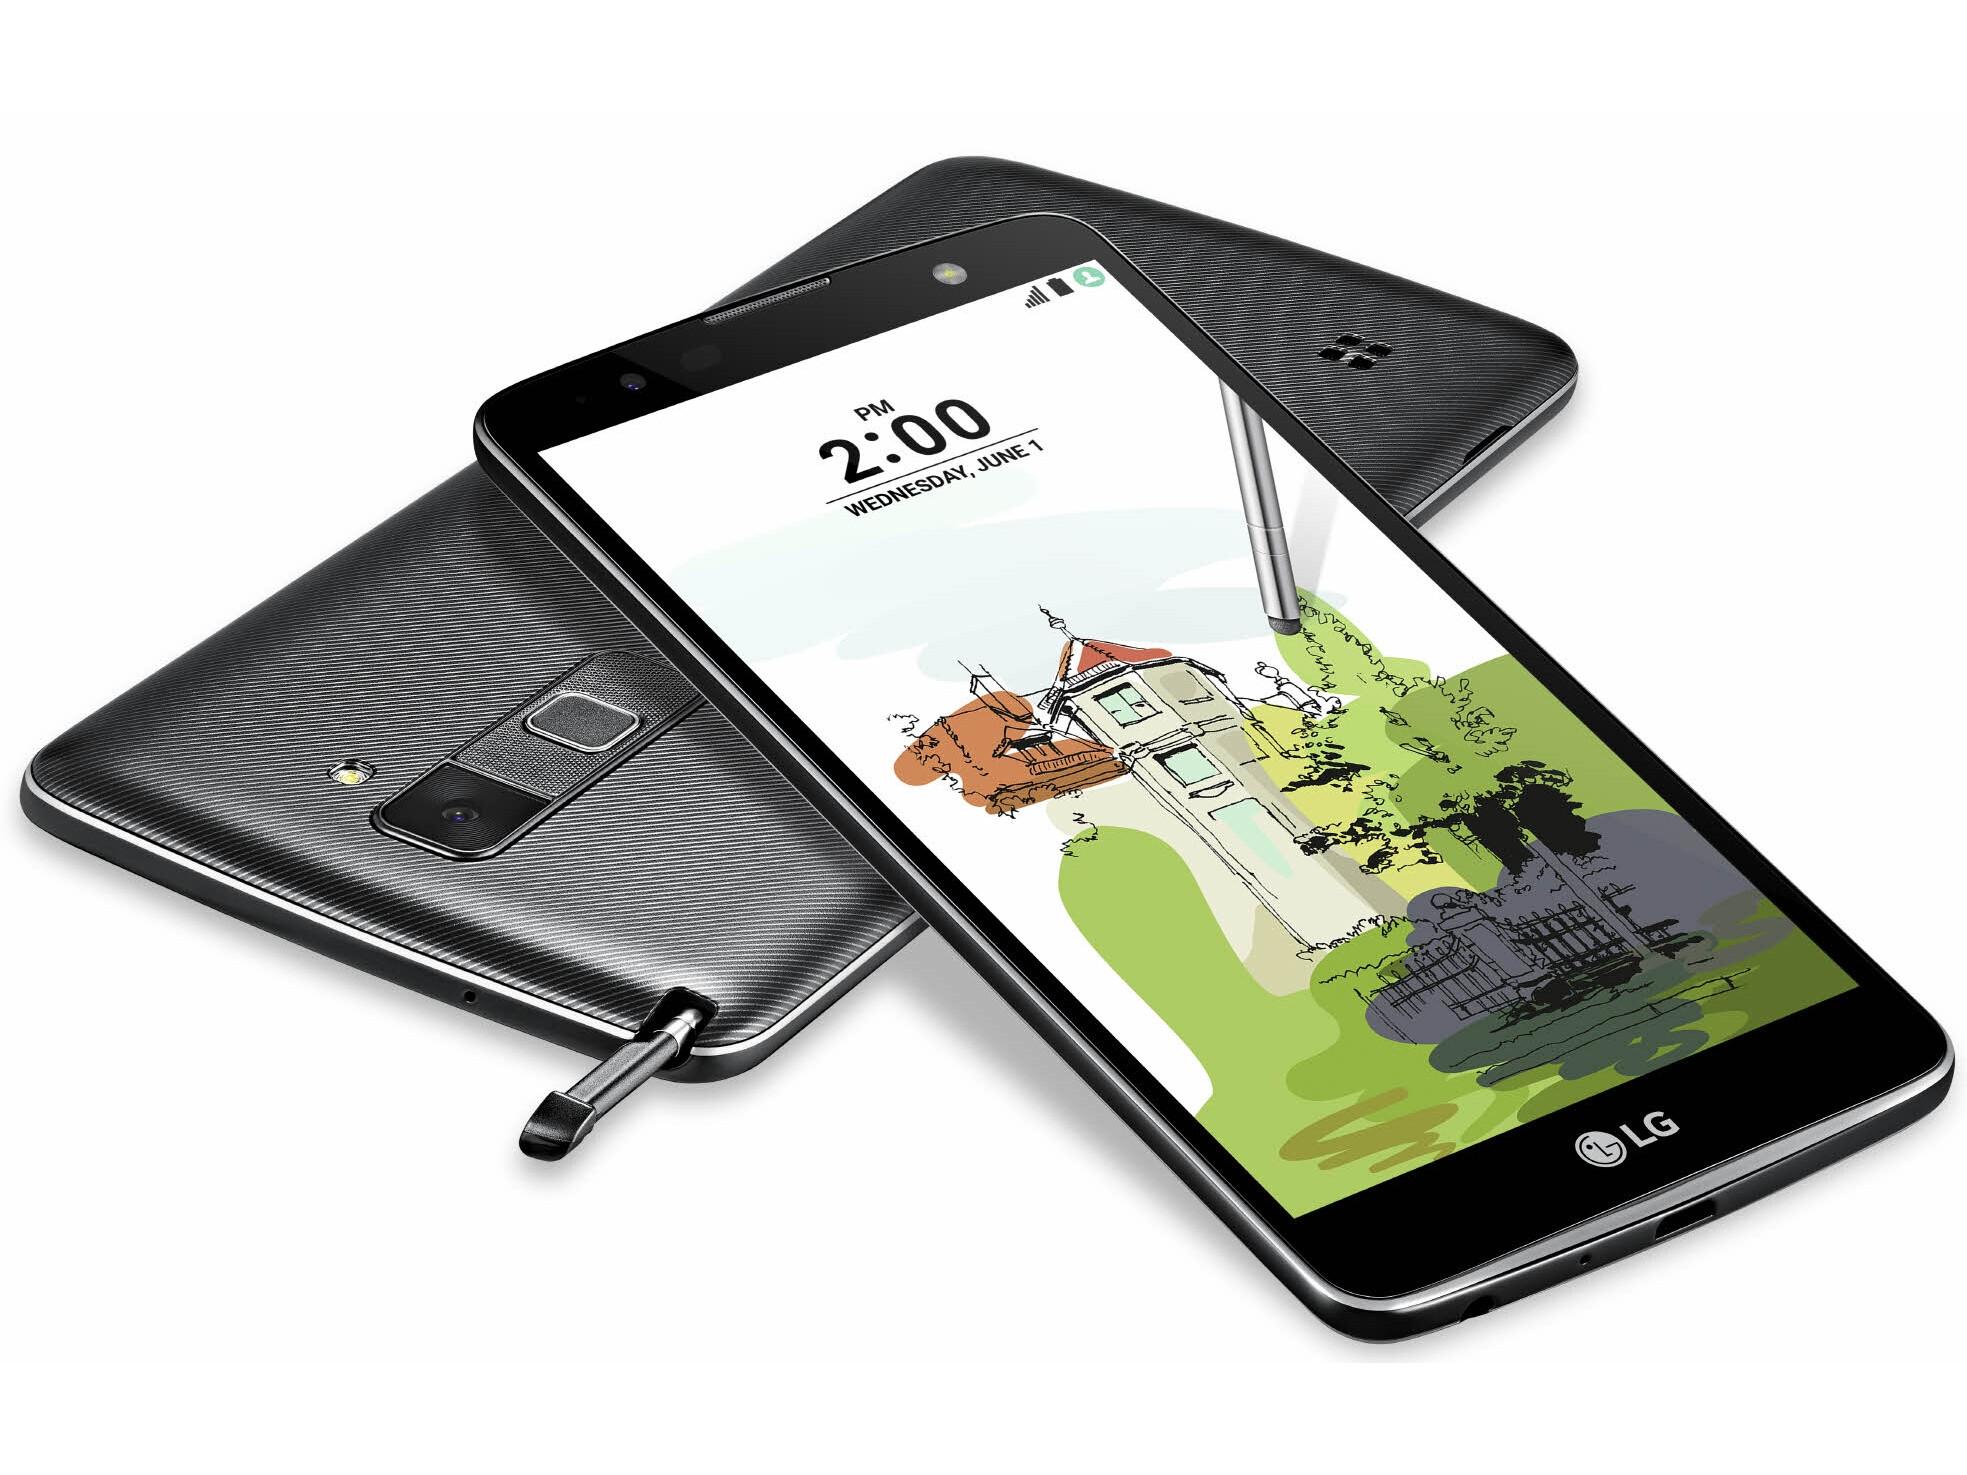 LG Stylus 2 Plus Phablet